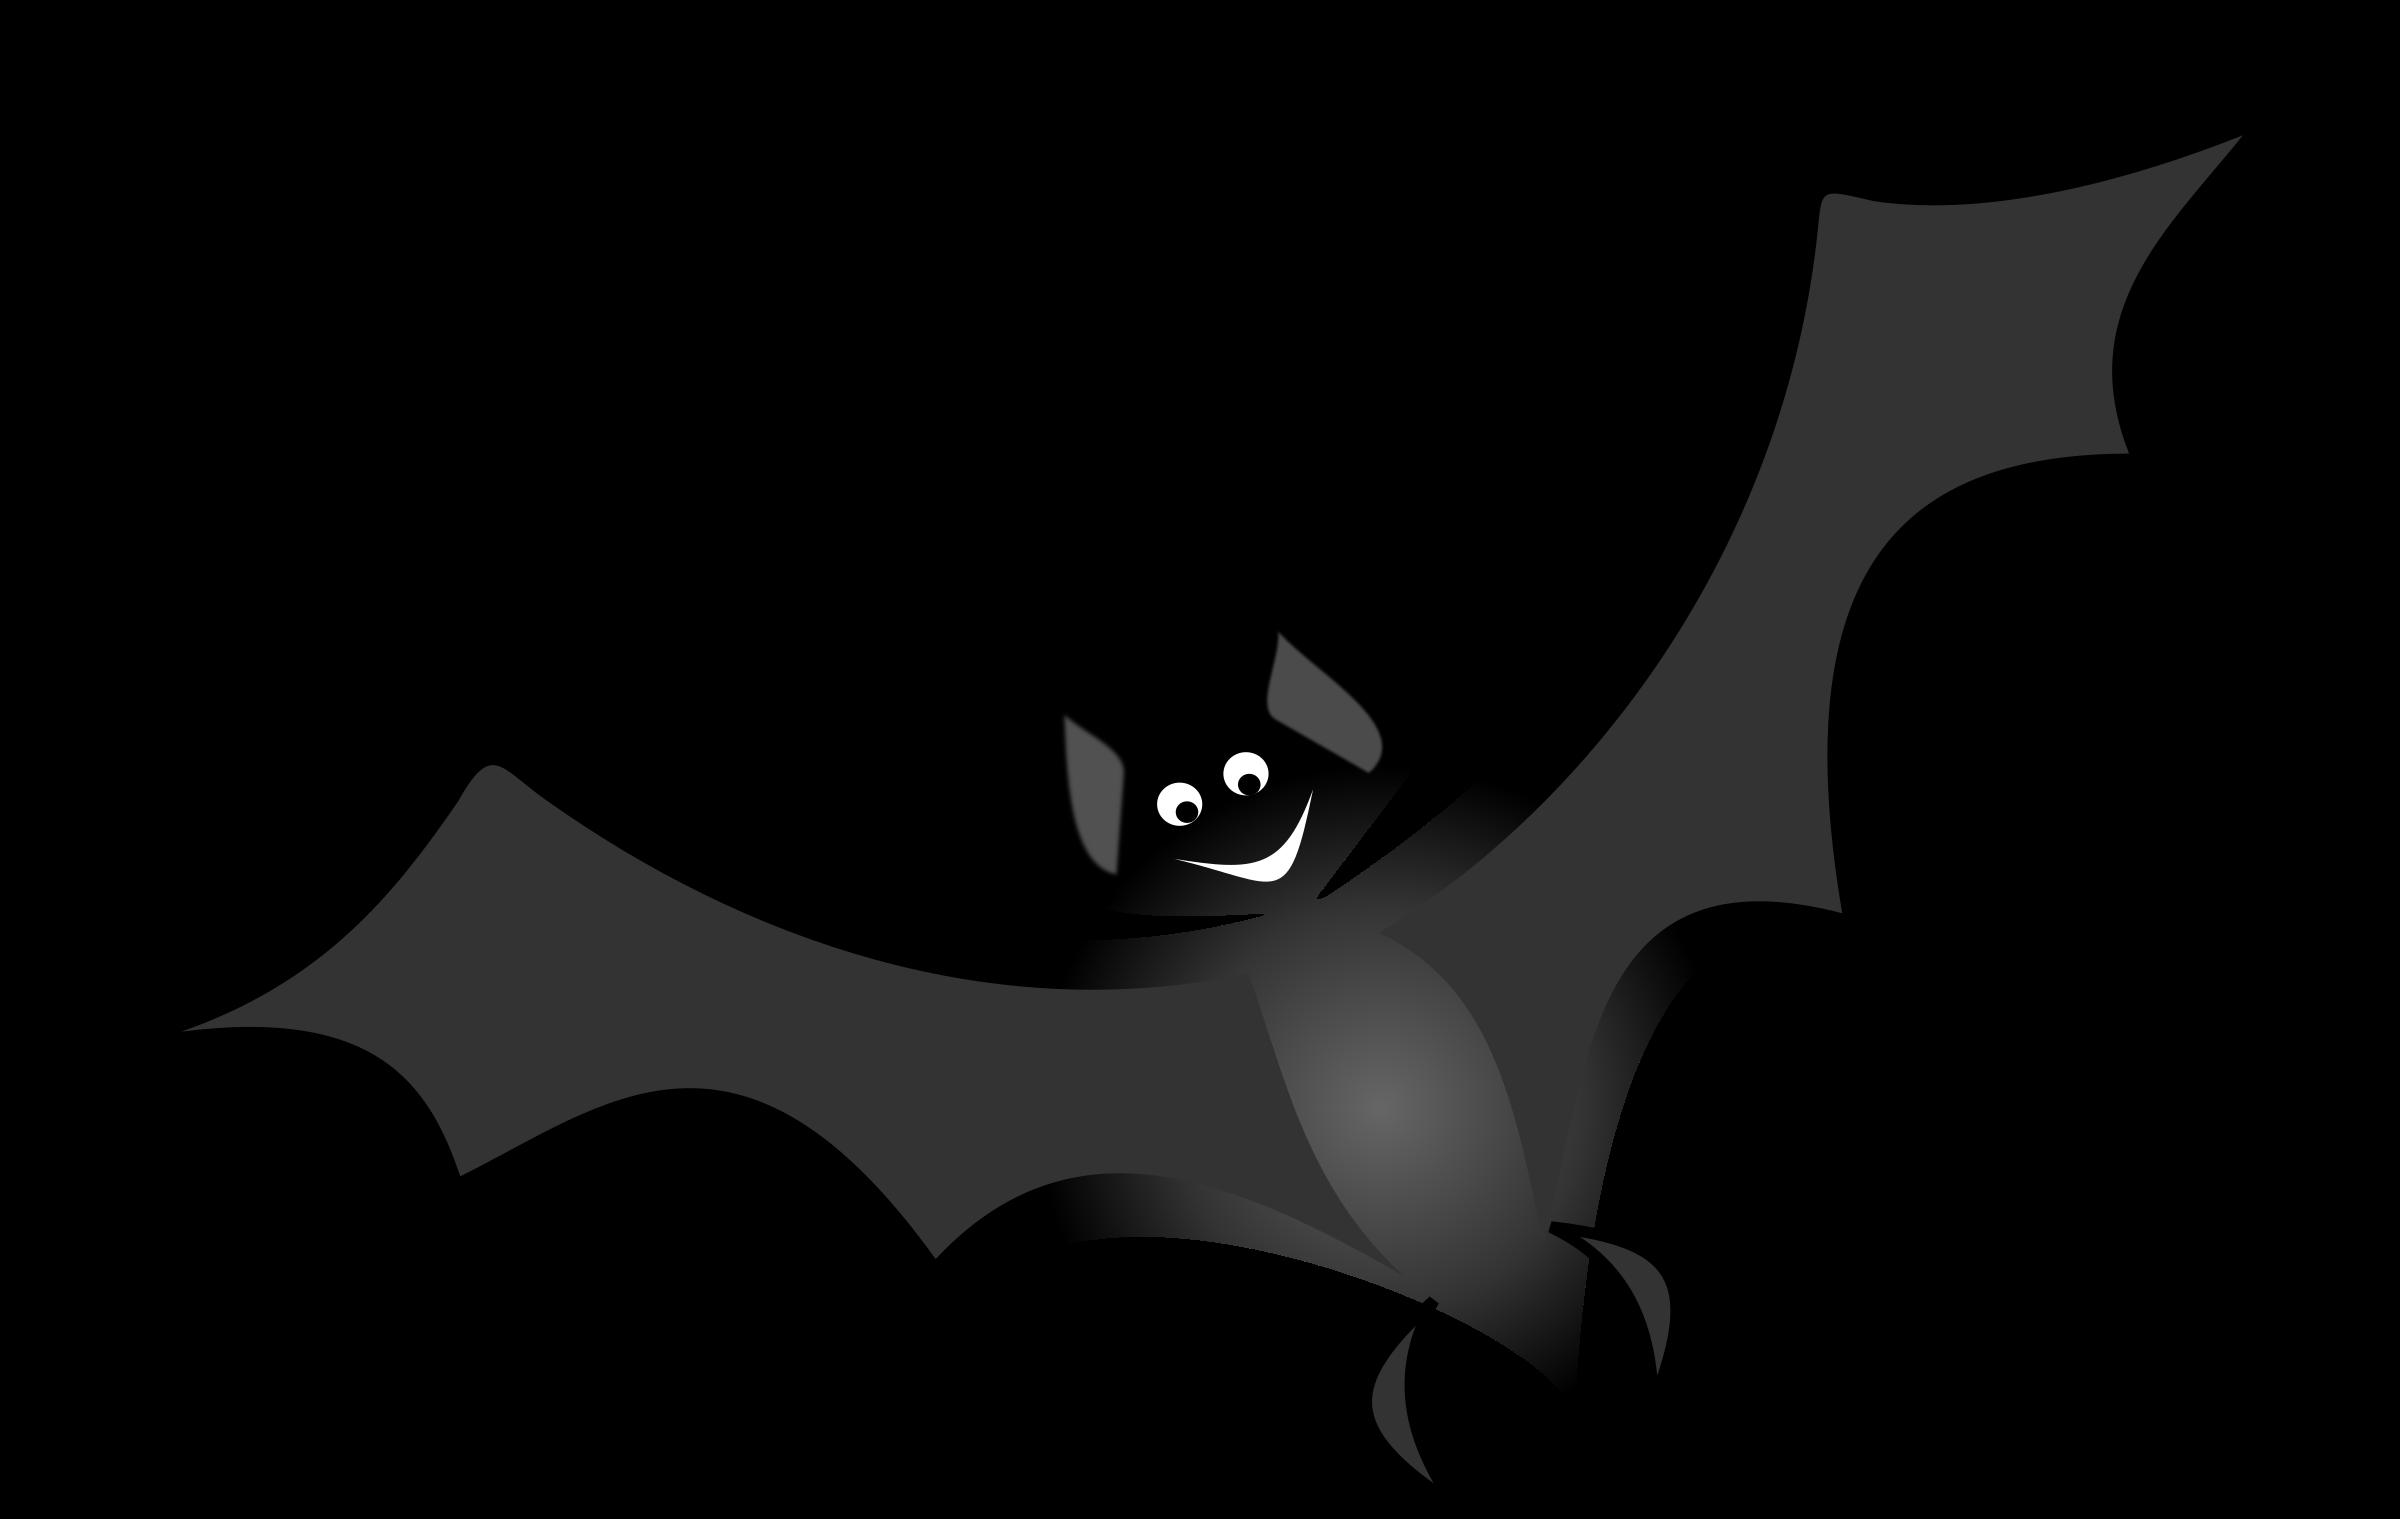 Bat clipart creepy.  spooky halloween writing